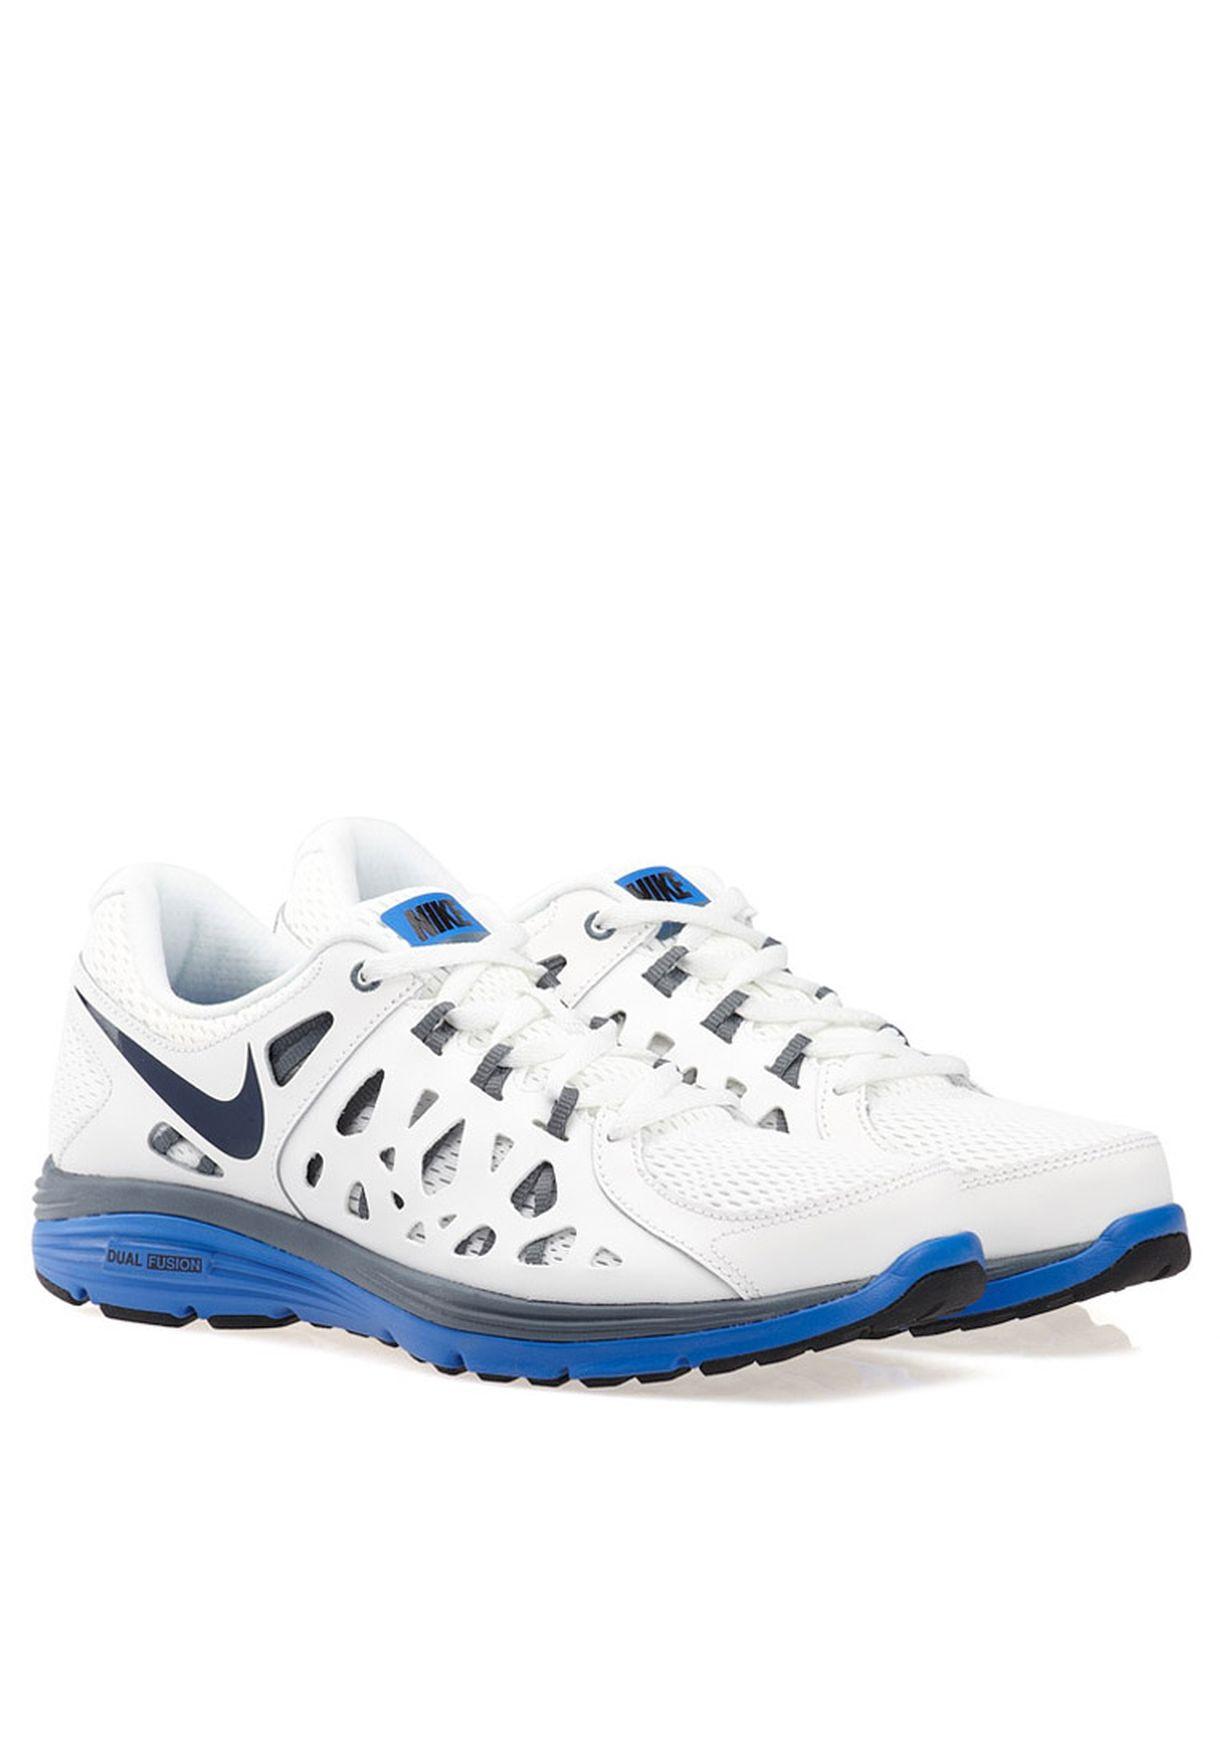 a7acfa407c979 Shop Nike white Nike Dual Fusion Run 2 599541-100 for Men in Qatar ...